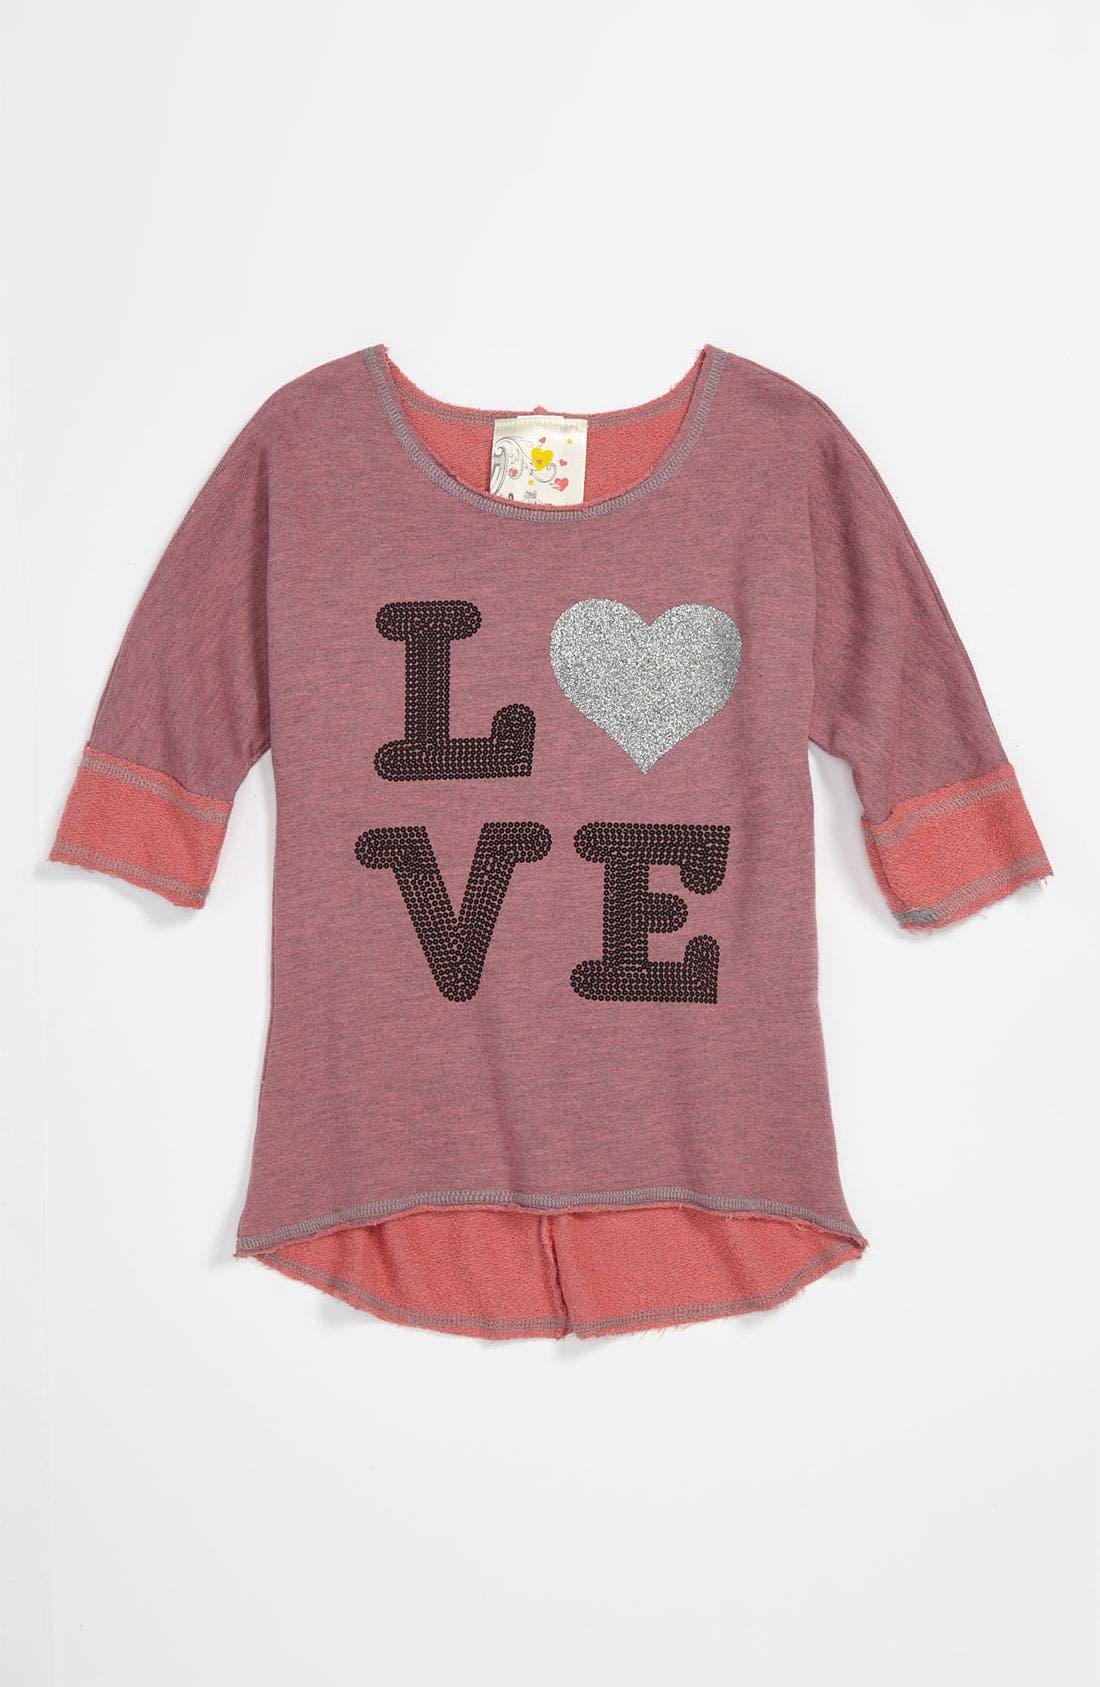 Main Image - Jenna & Jessie 'Love' Tunic (Little Girls)